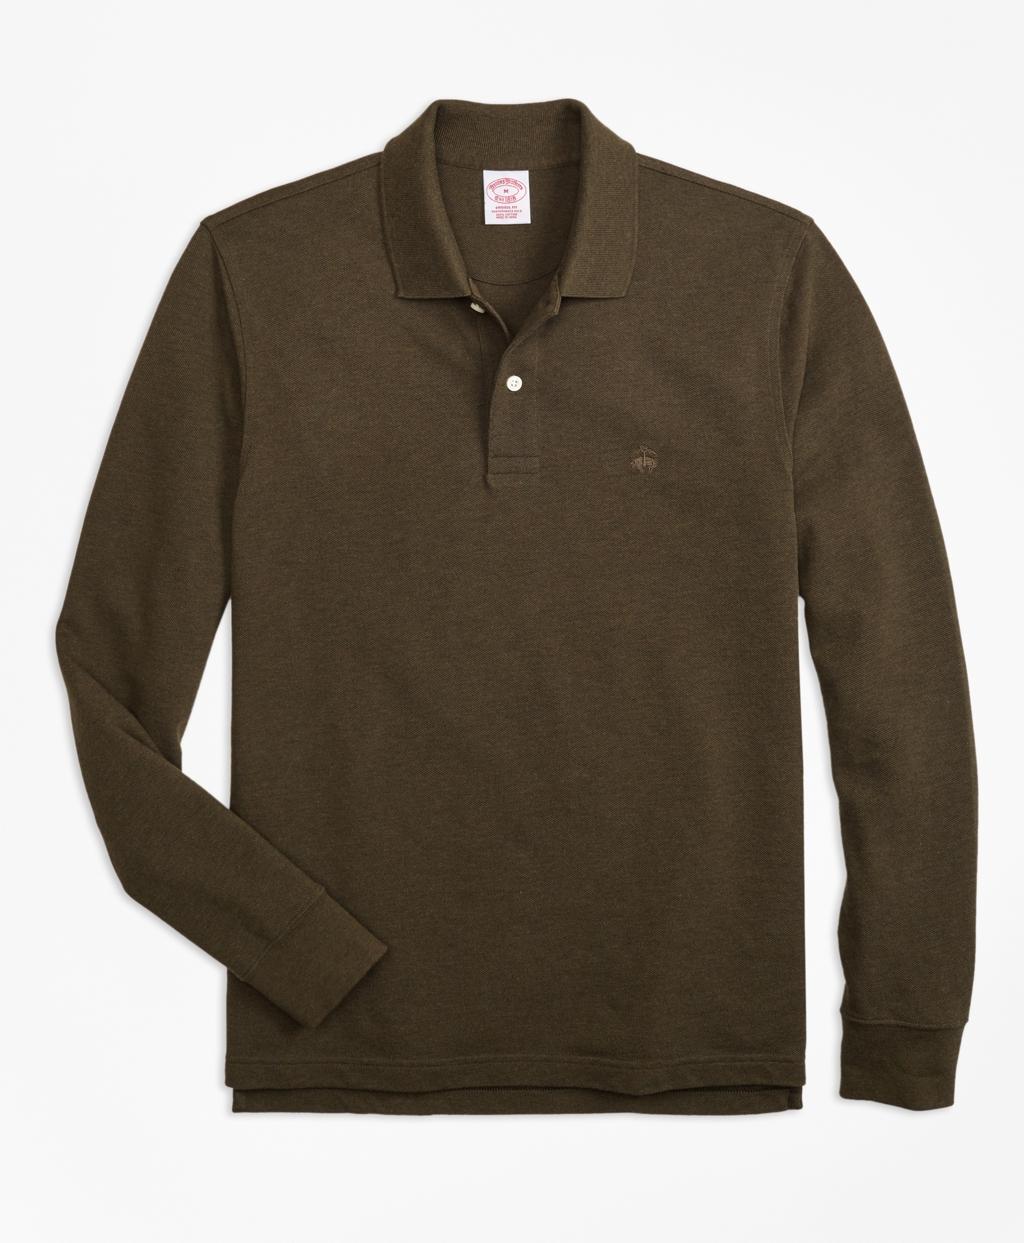 Original Fit Supima Long Sleeve Performance Polo Shirt Brooks